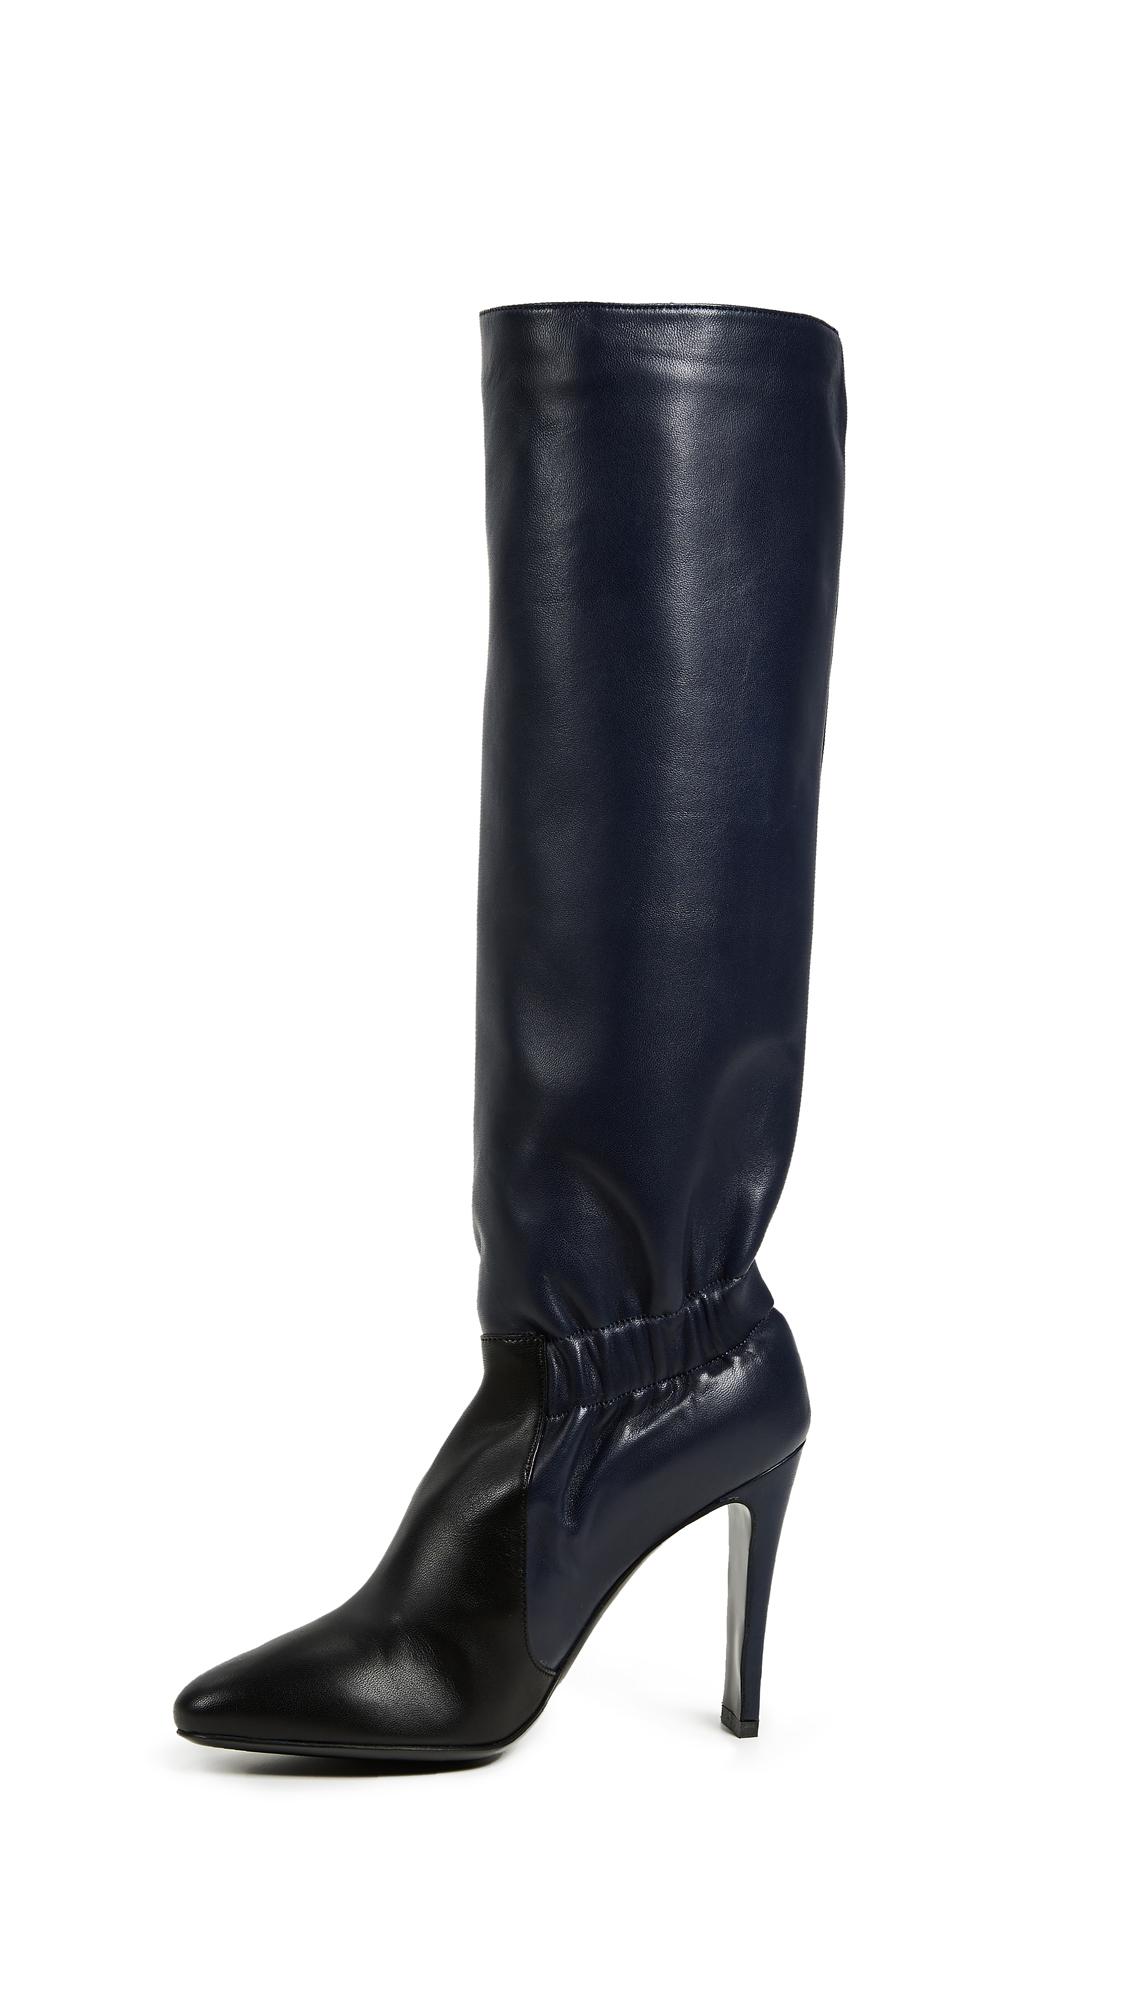 Laurence Dacade Shadia Boots - Navy/Black